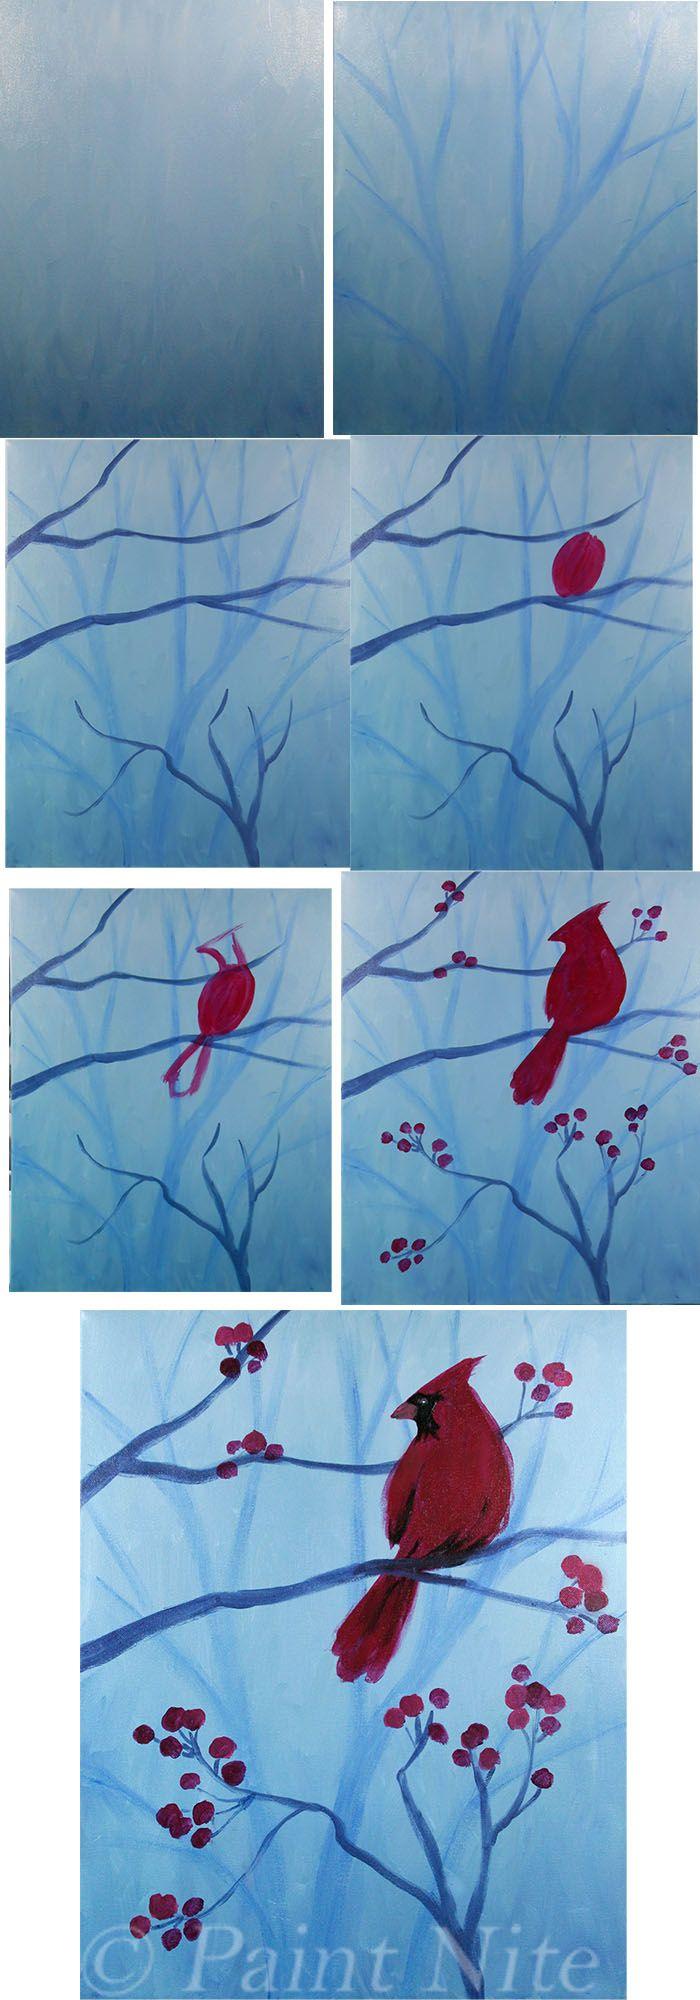 Winter Cardinal Process: Colors: Ultramarine Blue, White, Red, black.